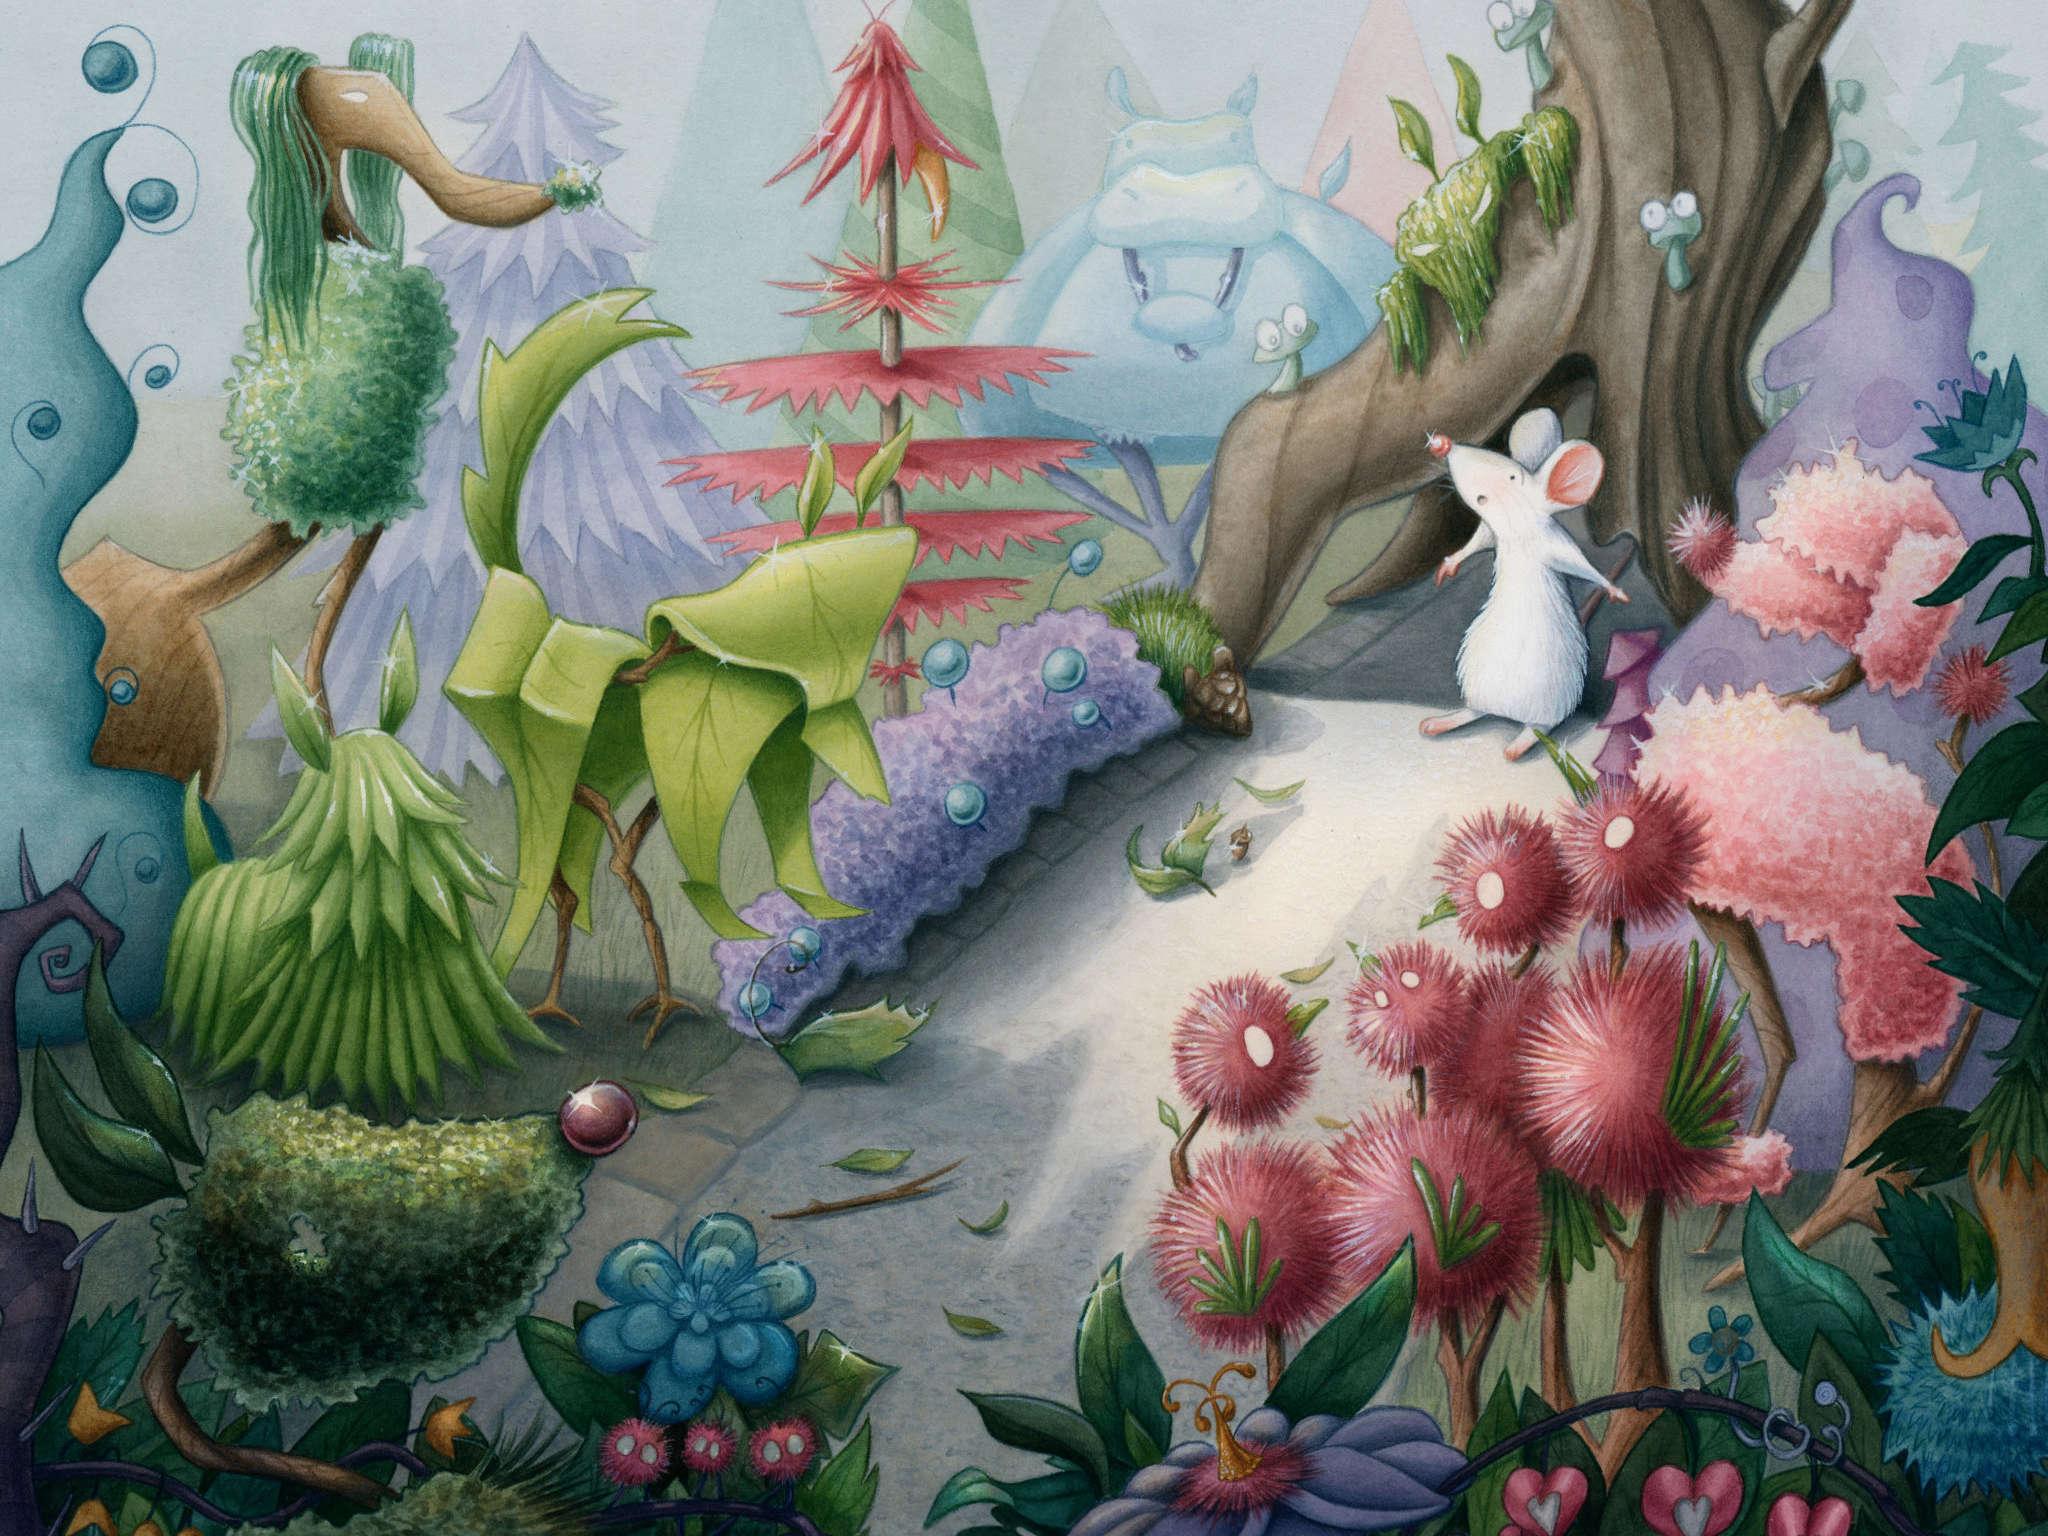 Illustration by School of Illustration student Kristin Makarius